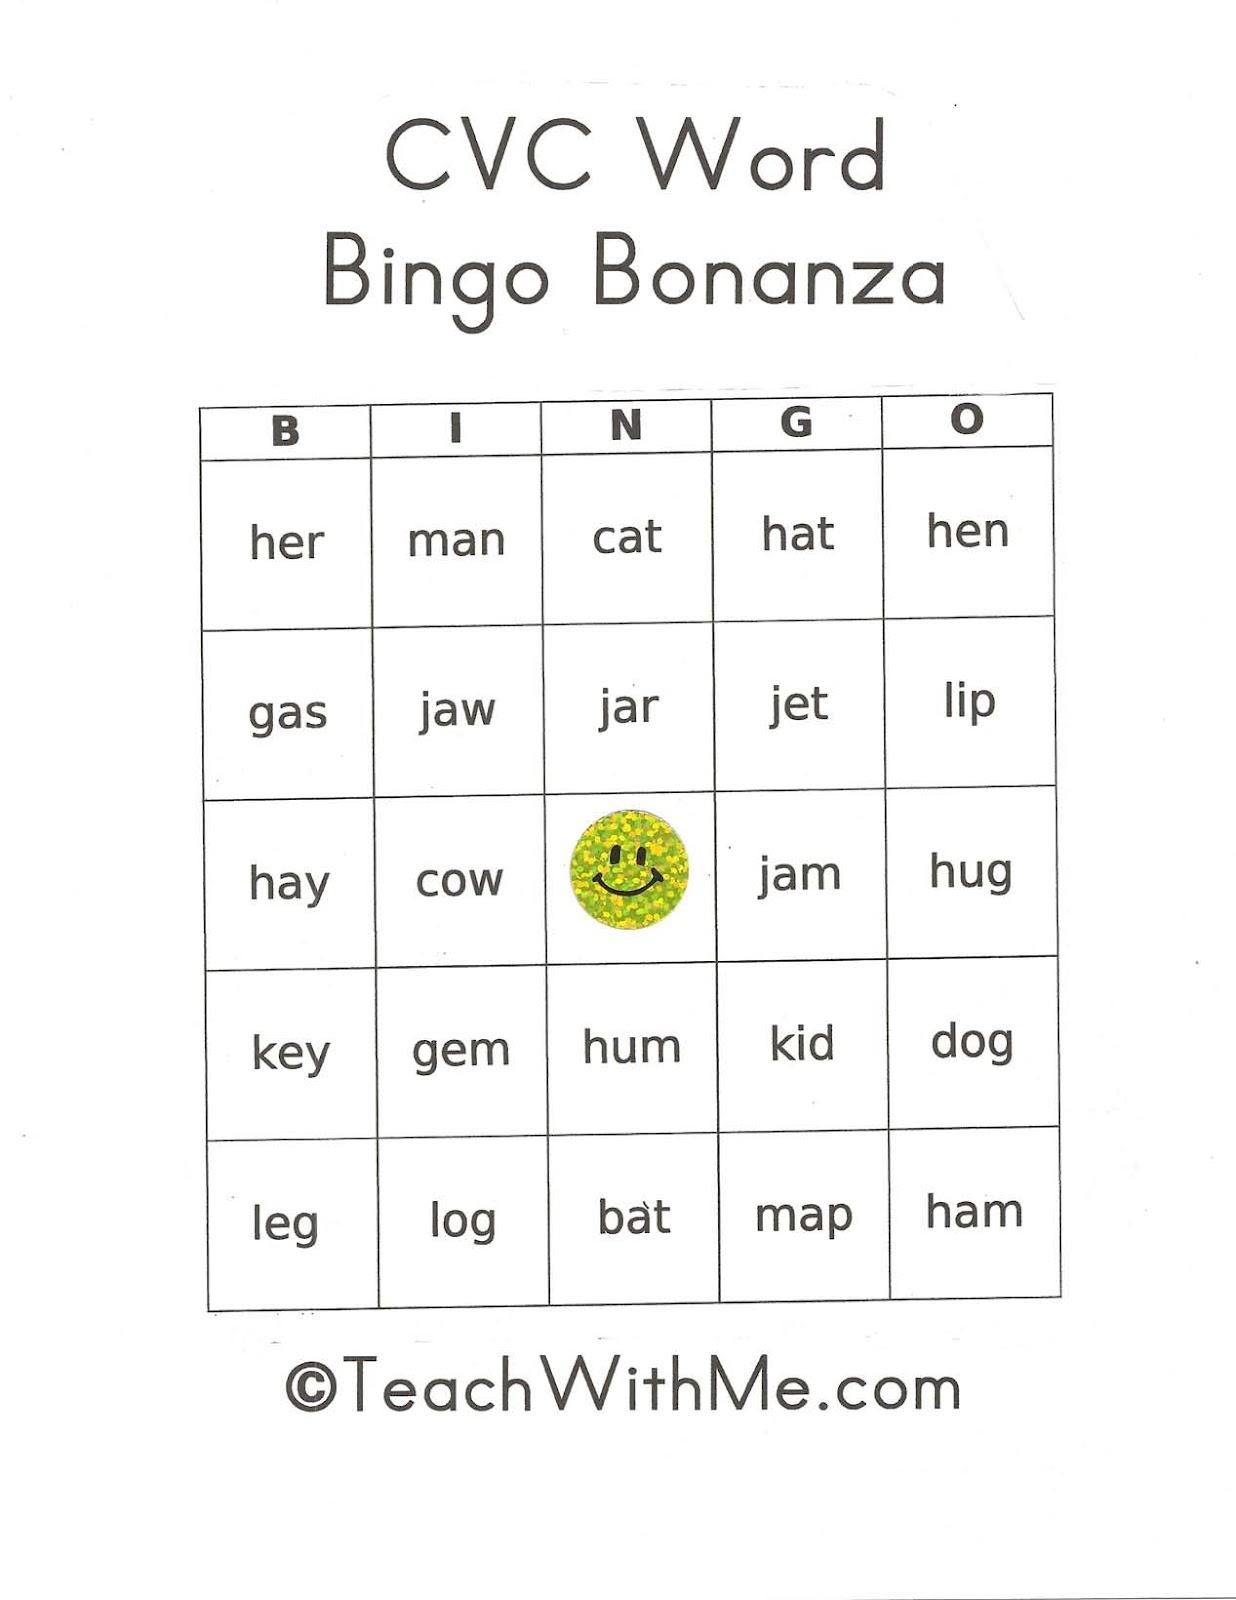 Cvc Word Bingo Bonanza